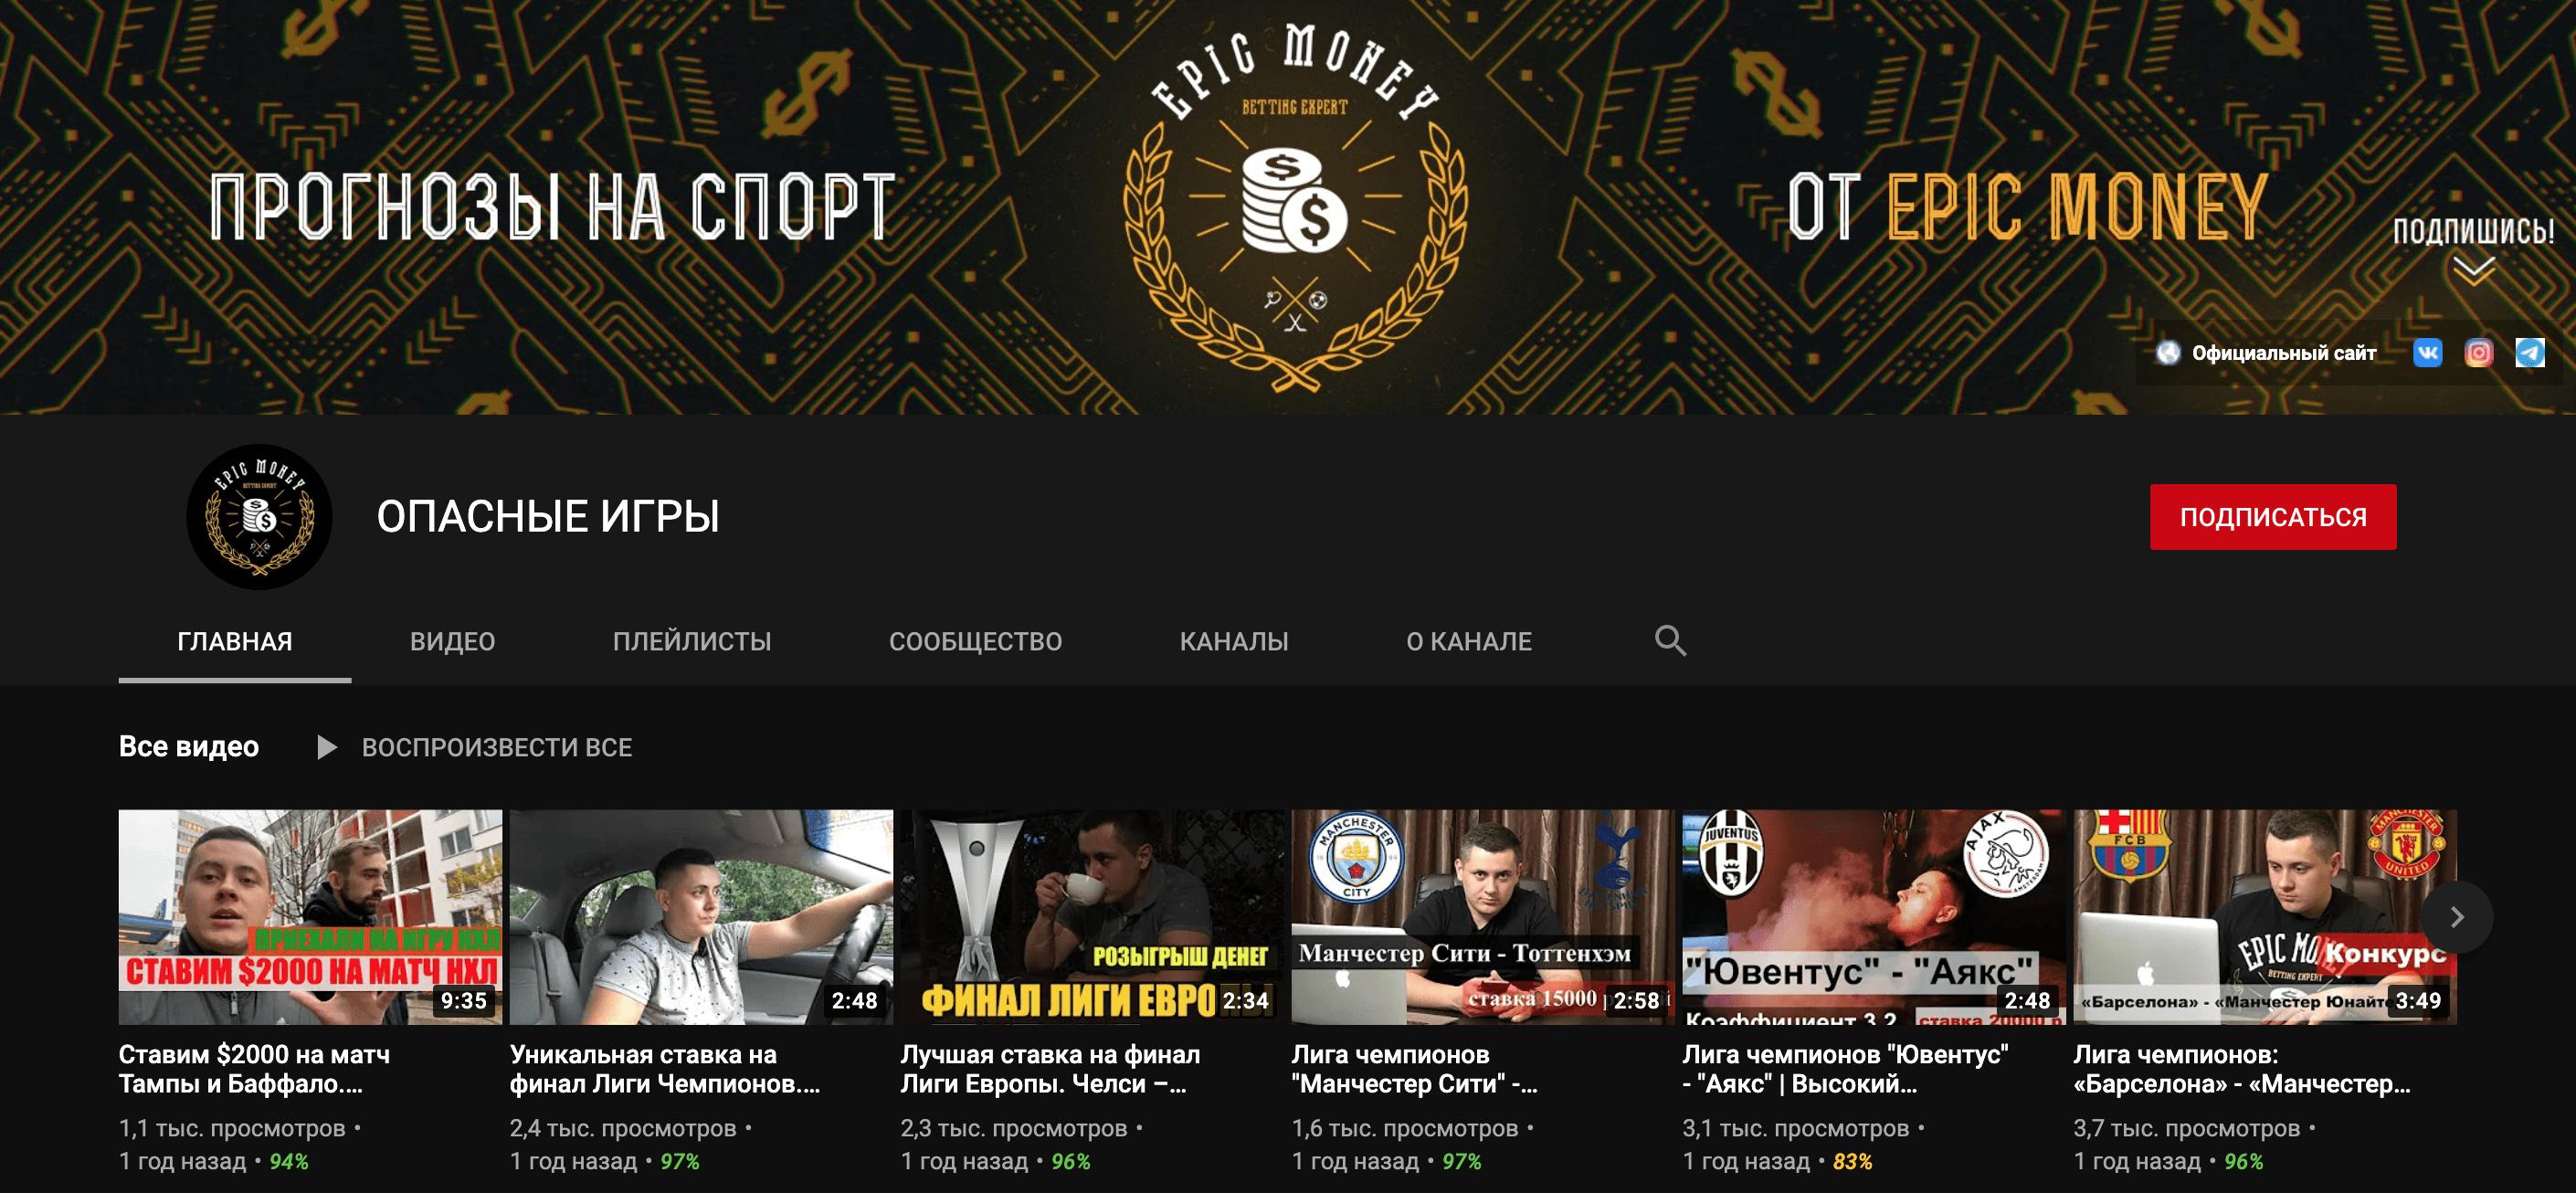 Ютуб канал Epic Money (Эпик мани)